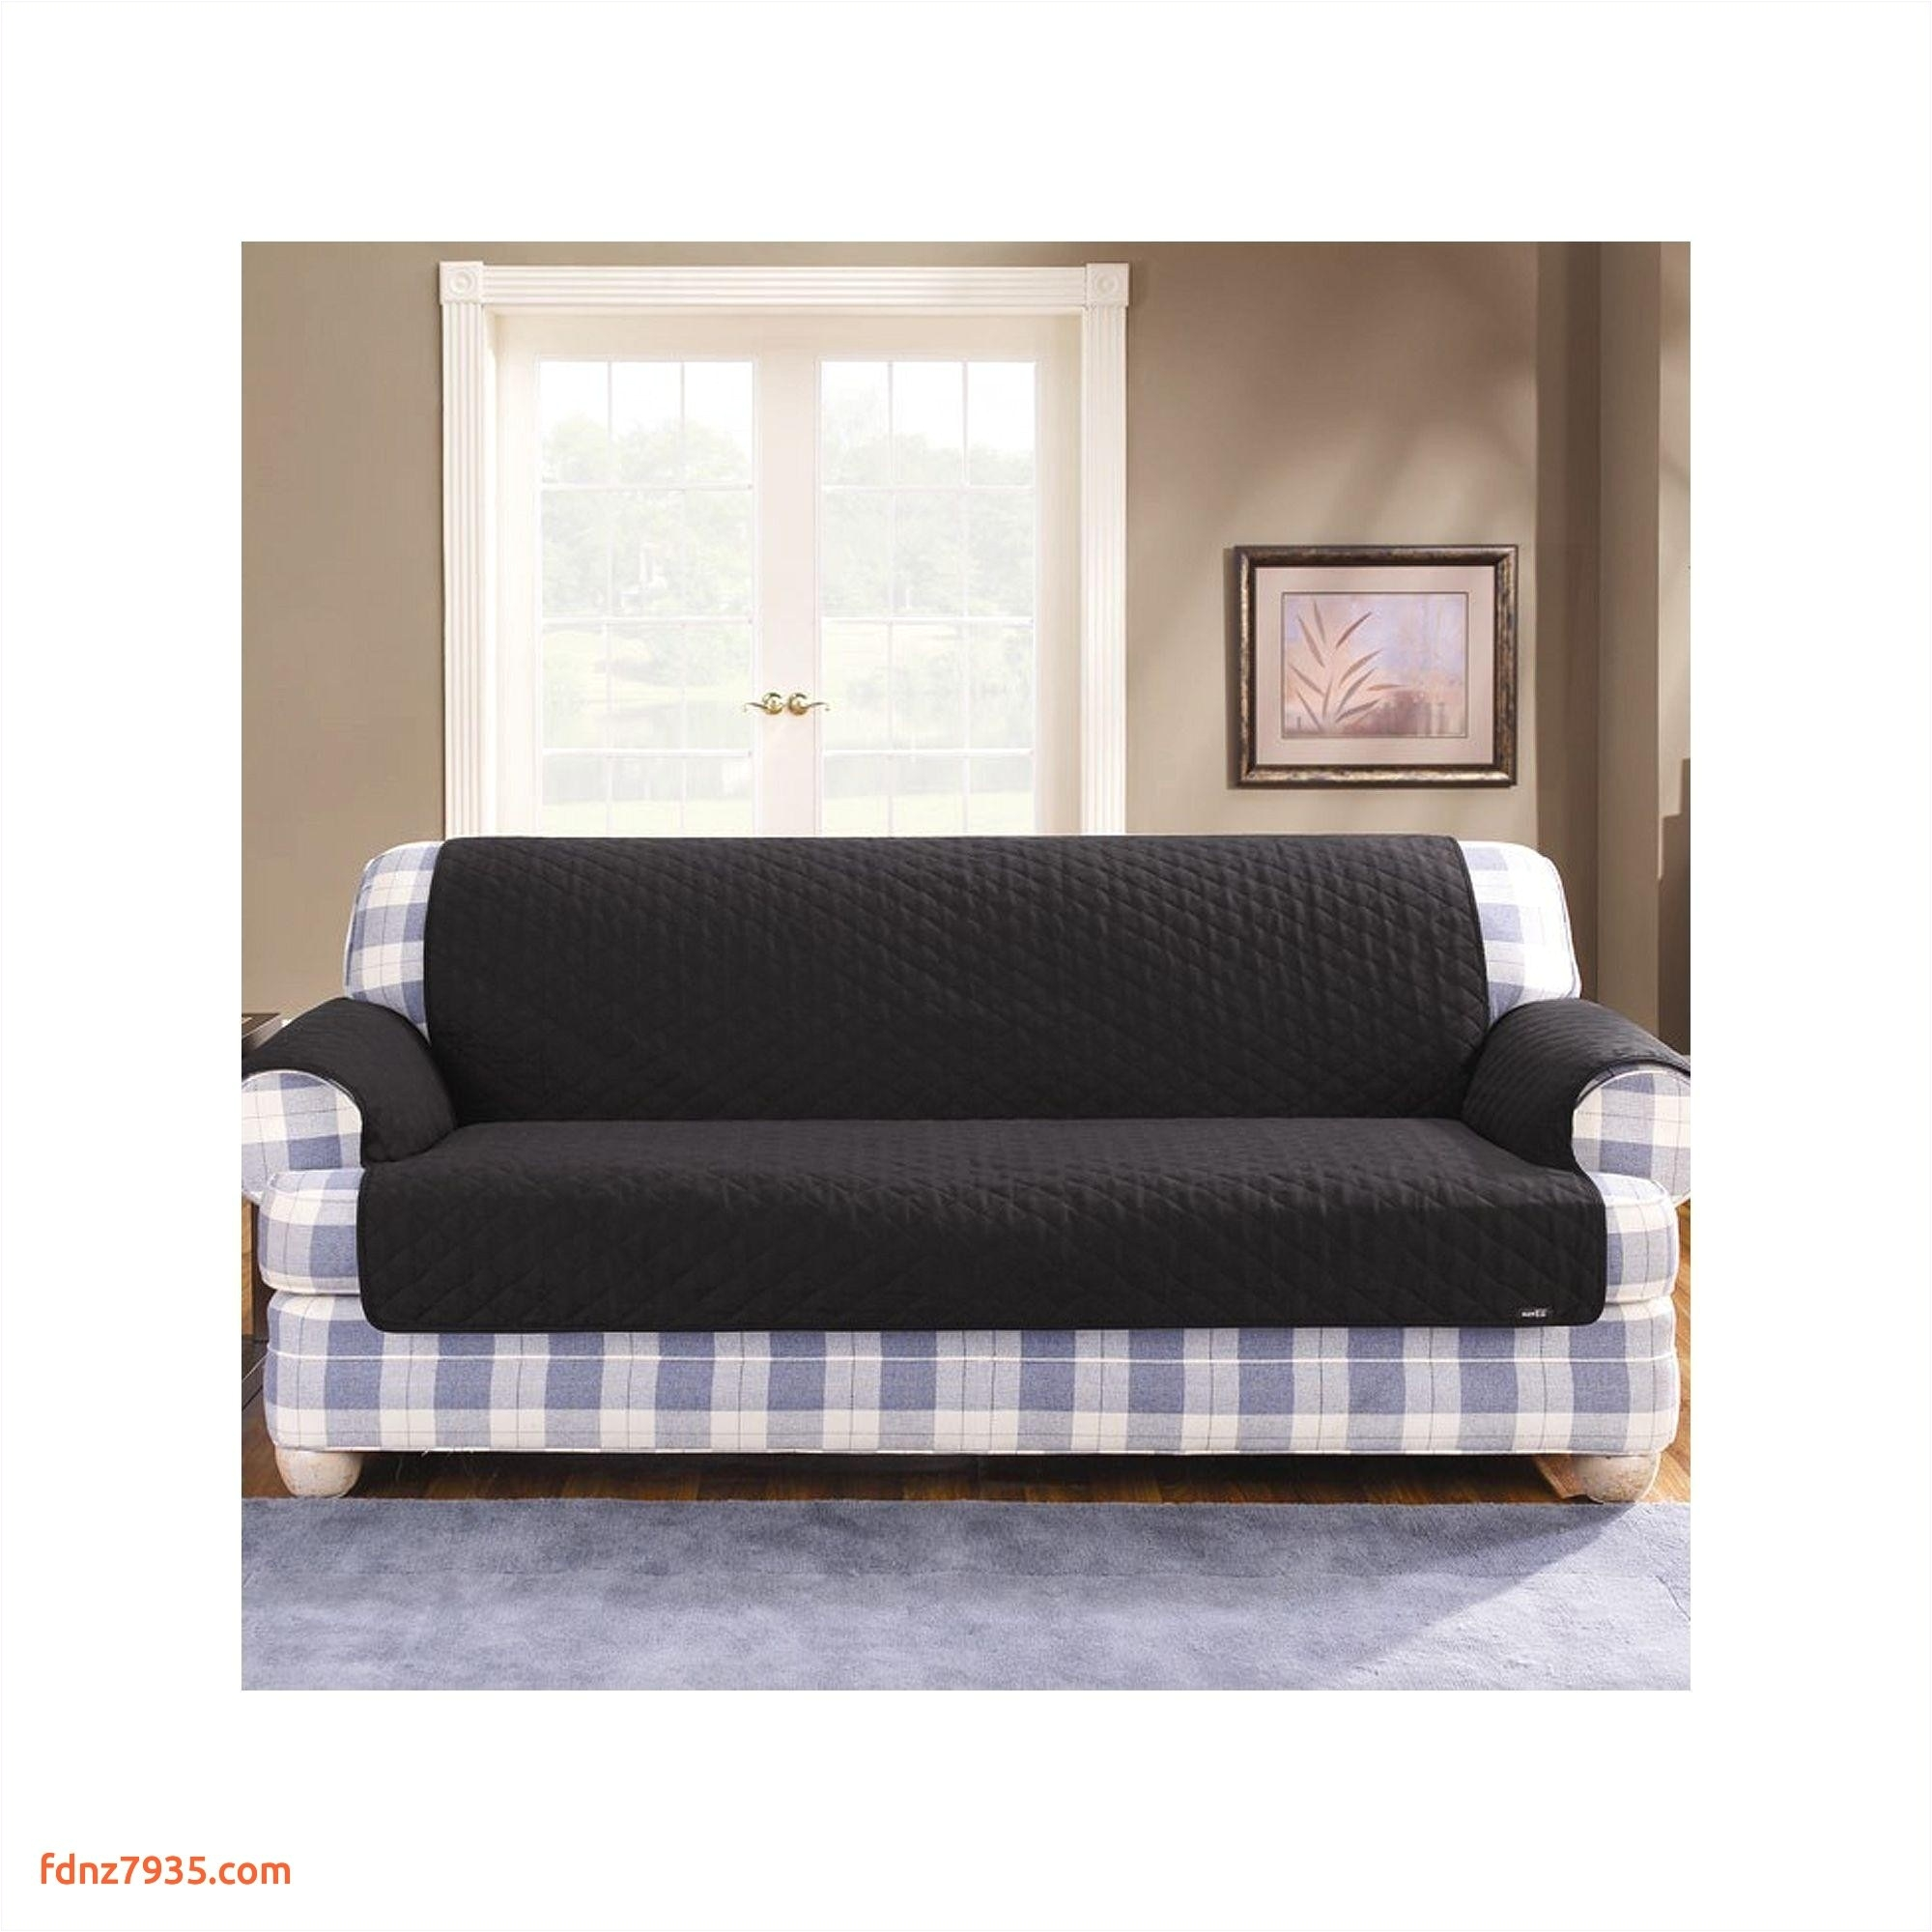 Furniture Outlets In north Carolina Sleeper sofas Walmart Fresh sofa Design